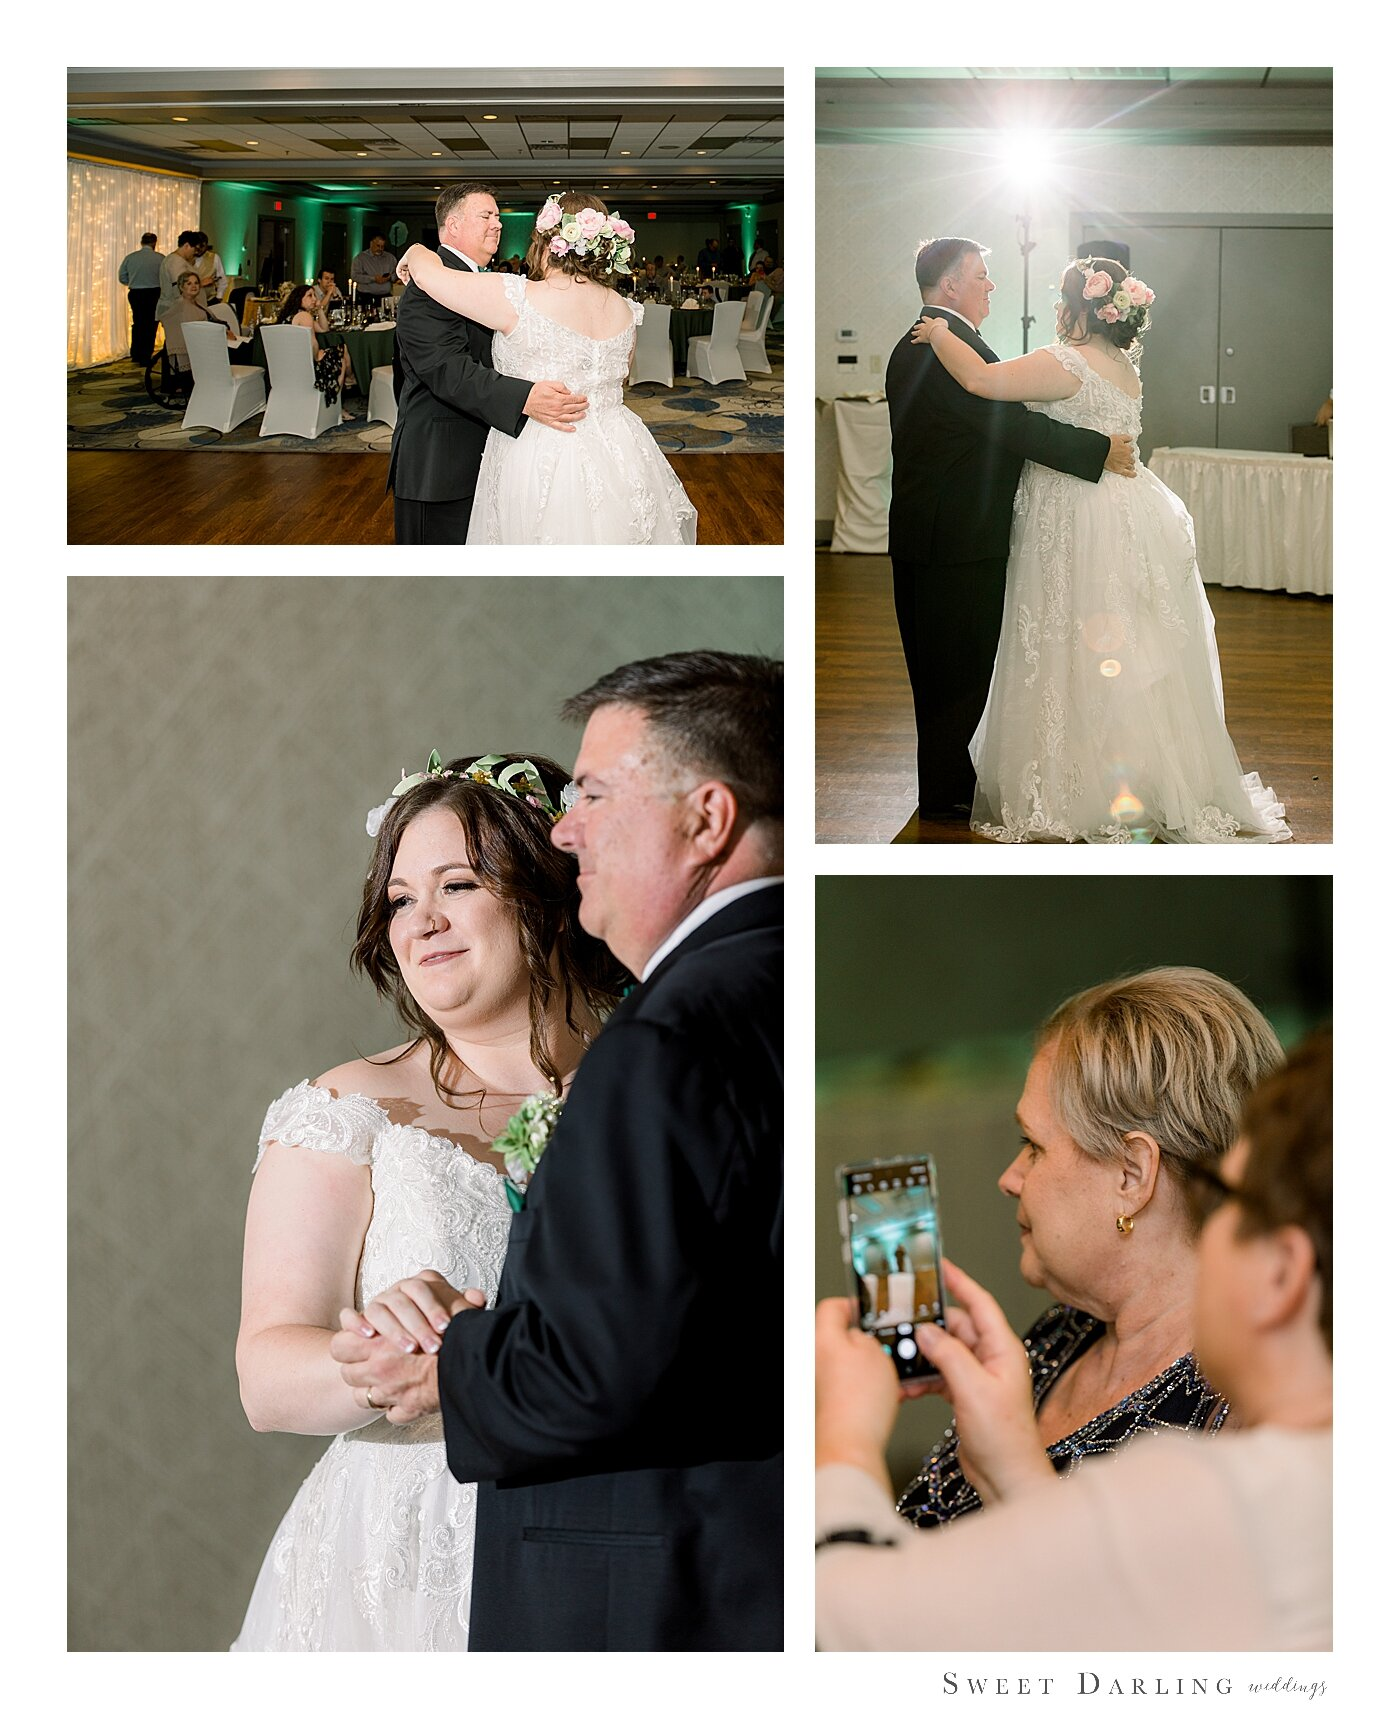 Bloomington-Normal-IL-Wedding-Photographer-eastland-suites-hotel_0013.jpg